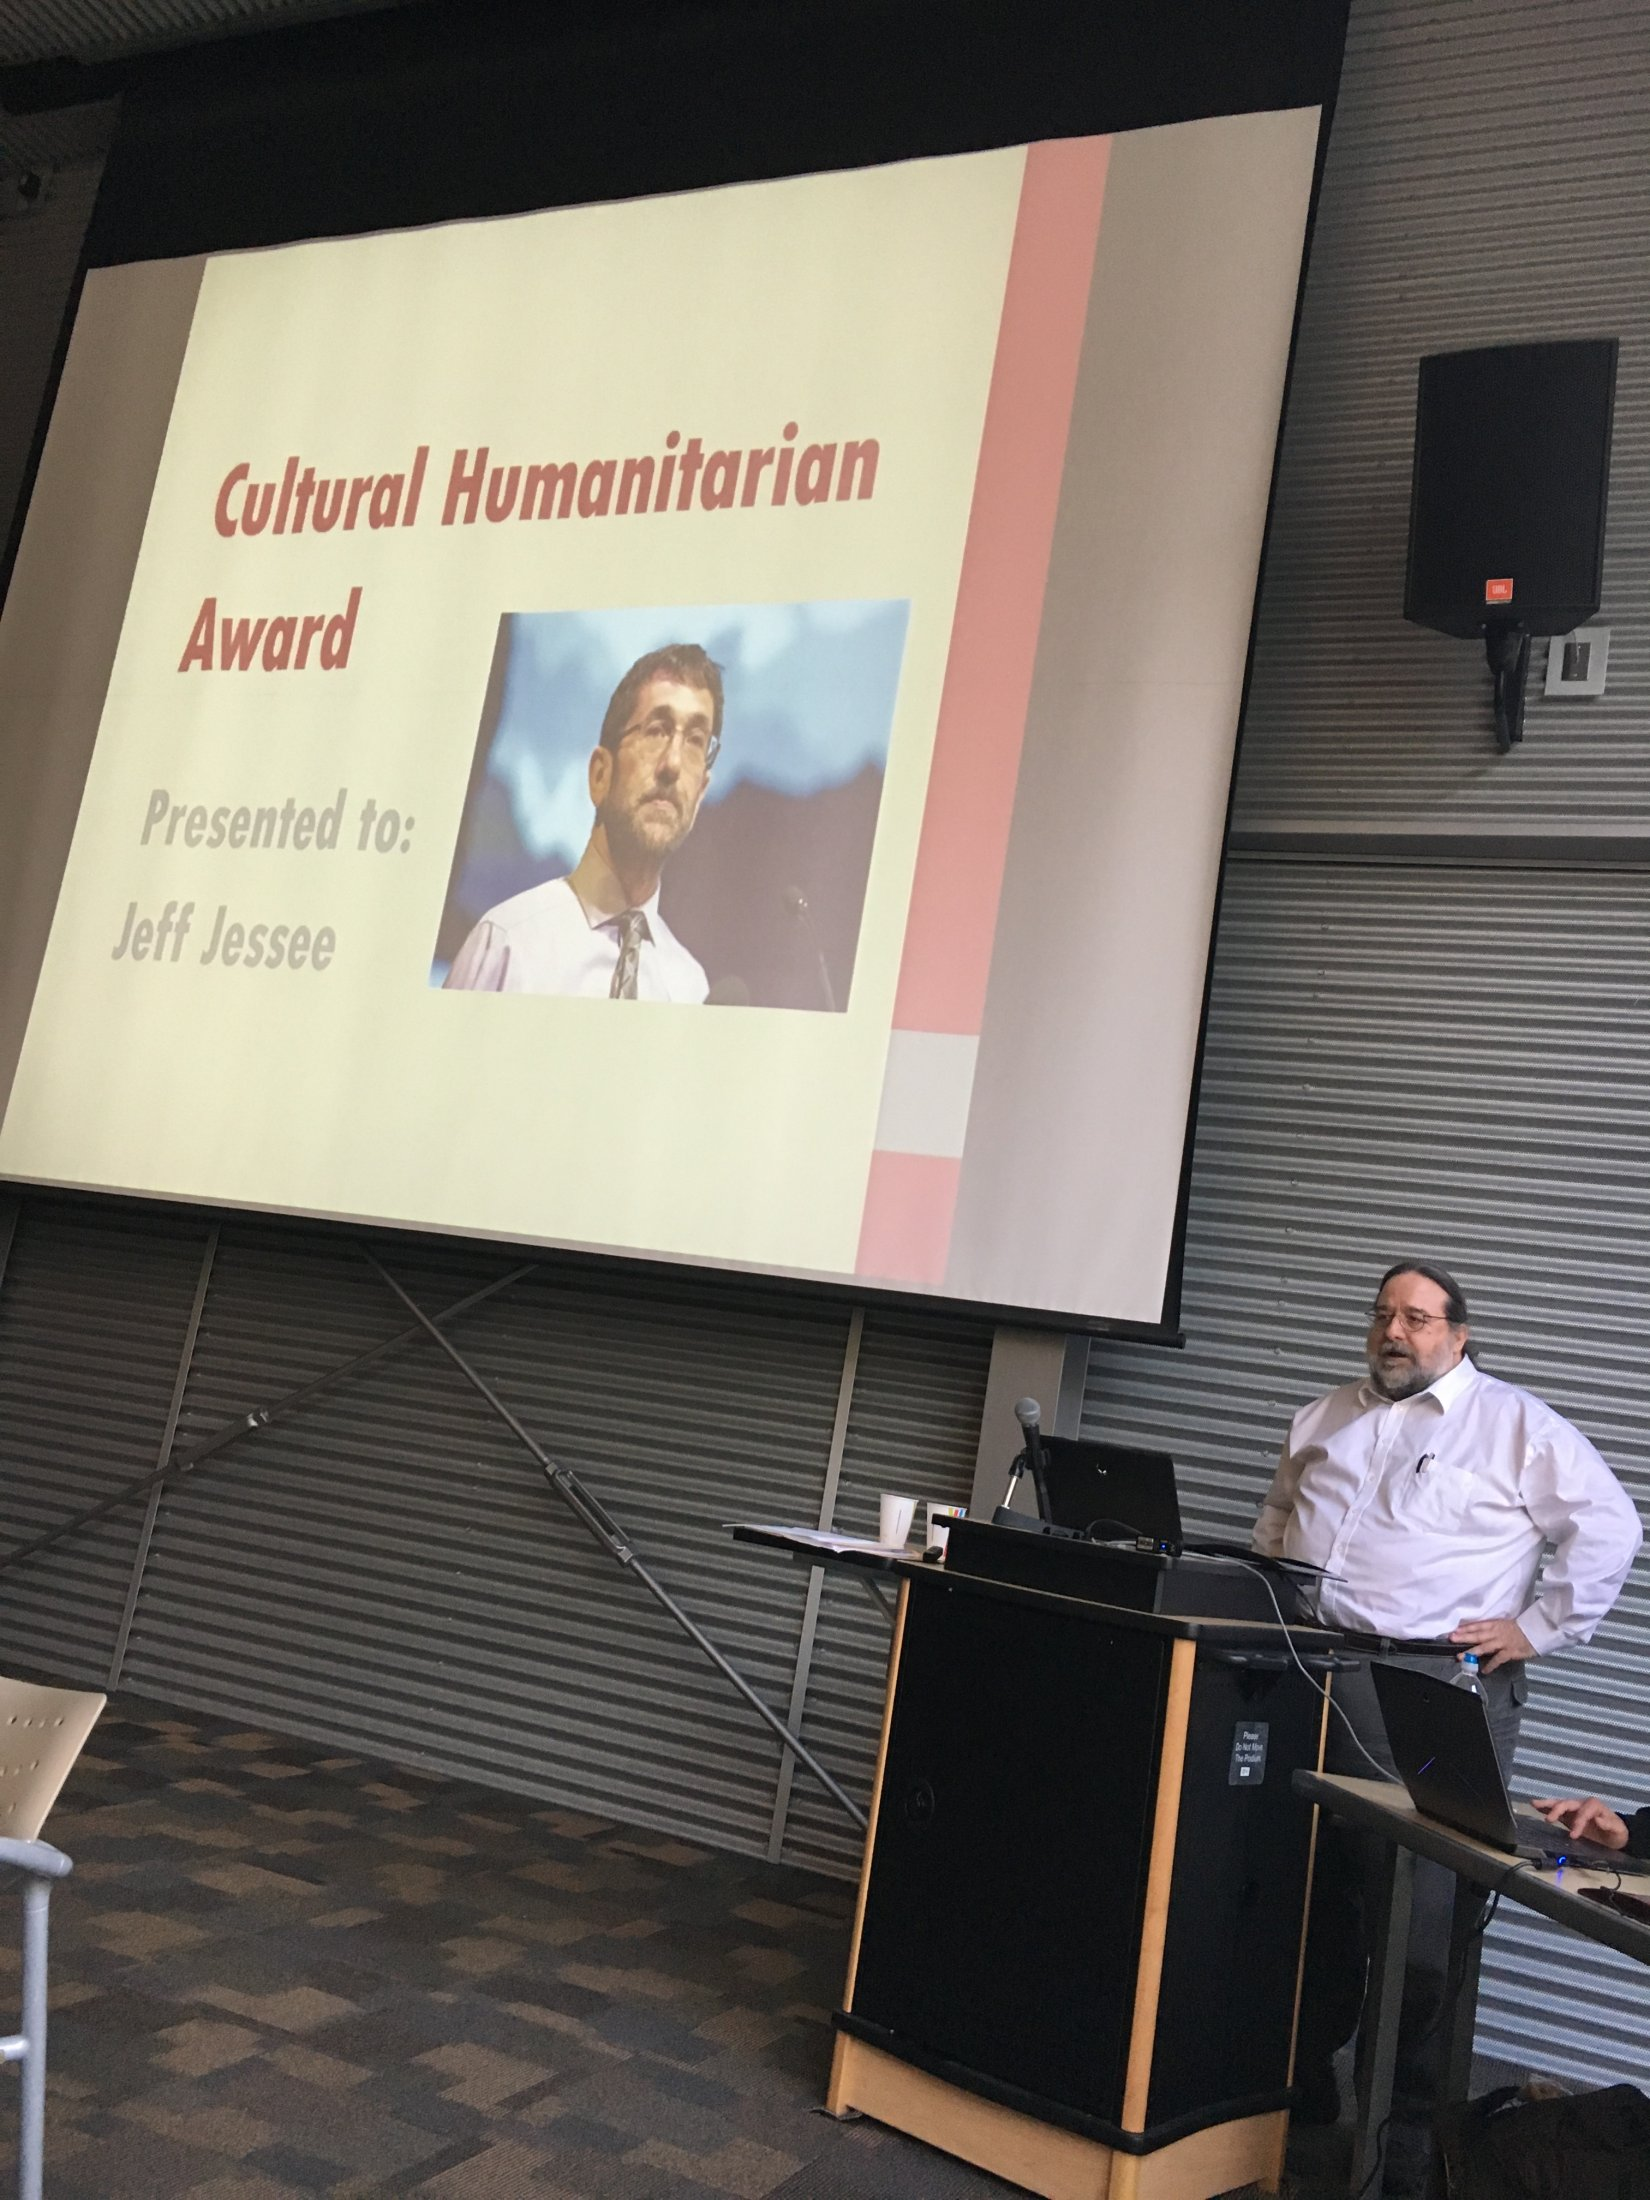 Cultural Humanitarian Award